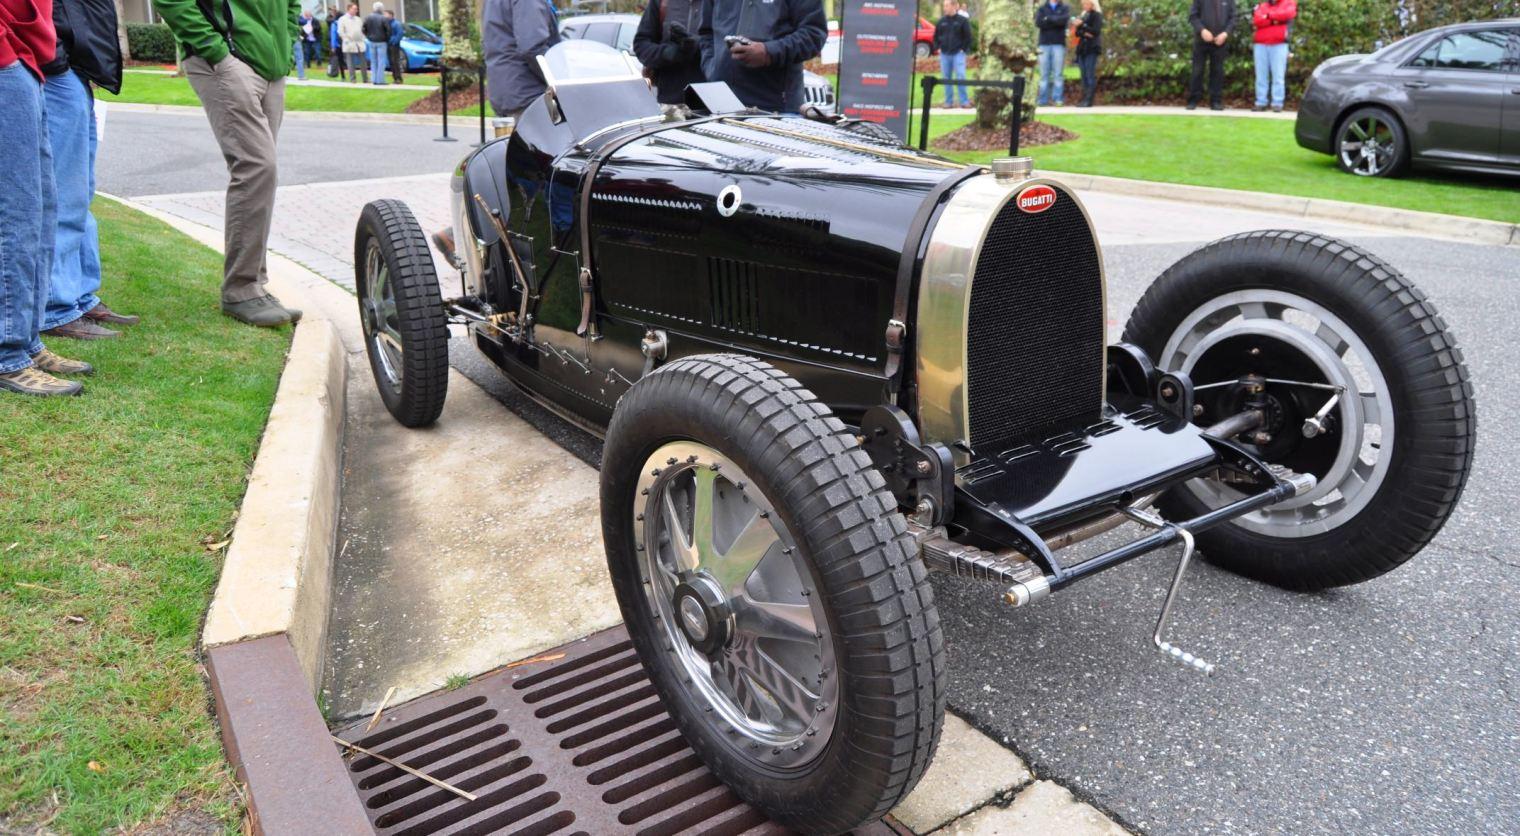 PurSang Argentina Shows Innovative Marketing with Street-Parked 1920s Bugatti GP Car23